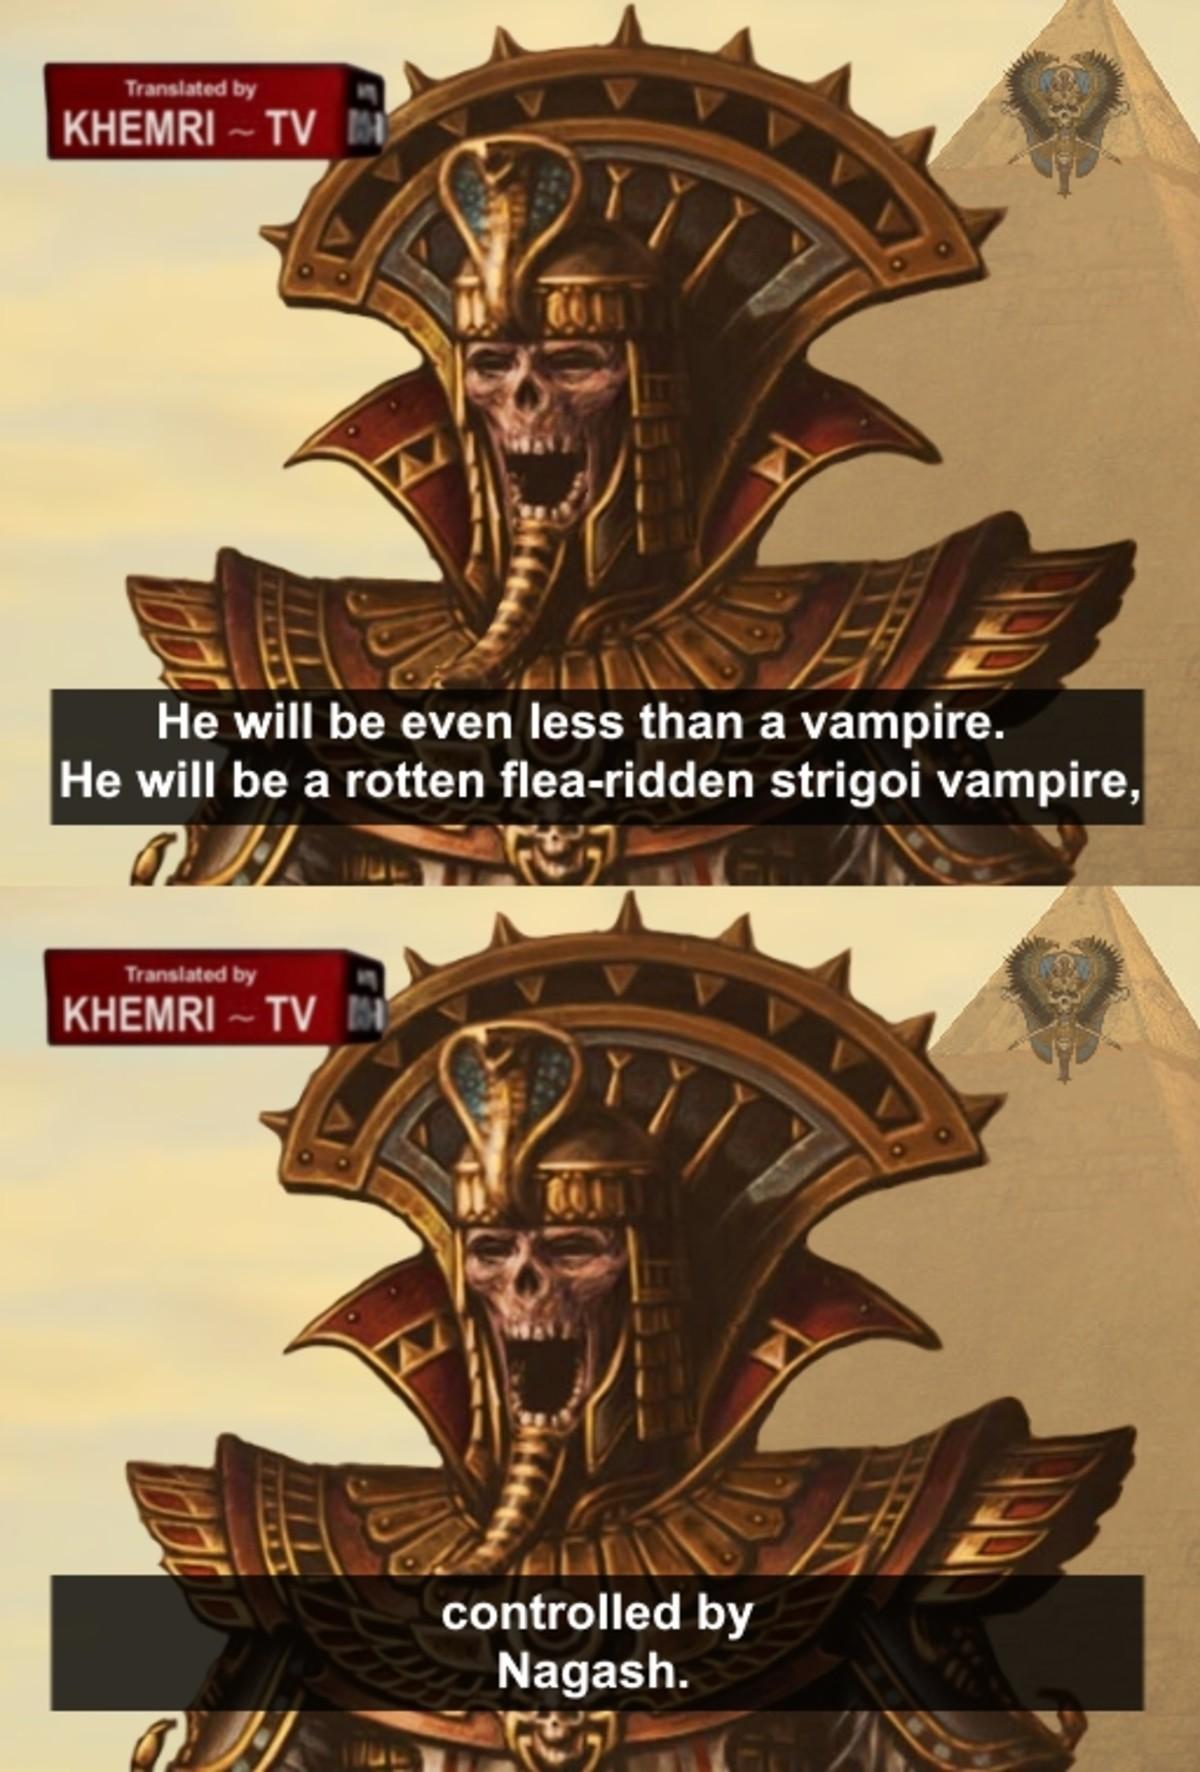 Warhammer 40K - Page 2 Khemri_3a6c8b_6481232